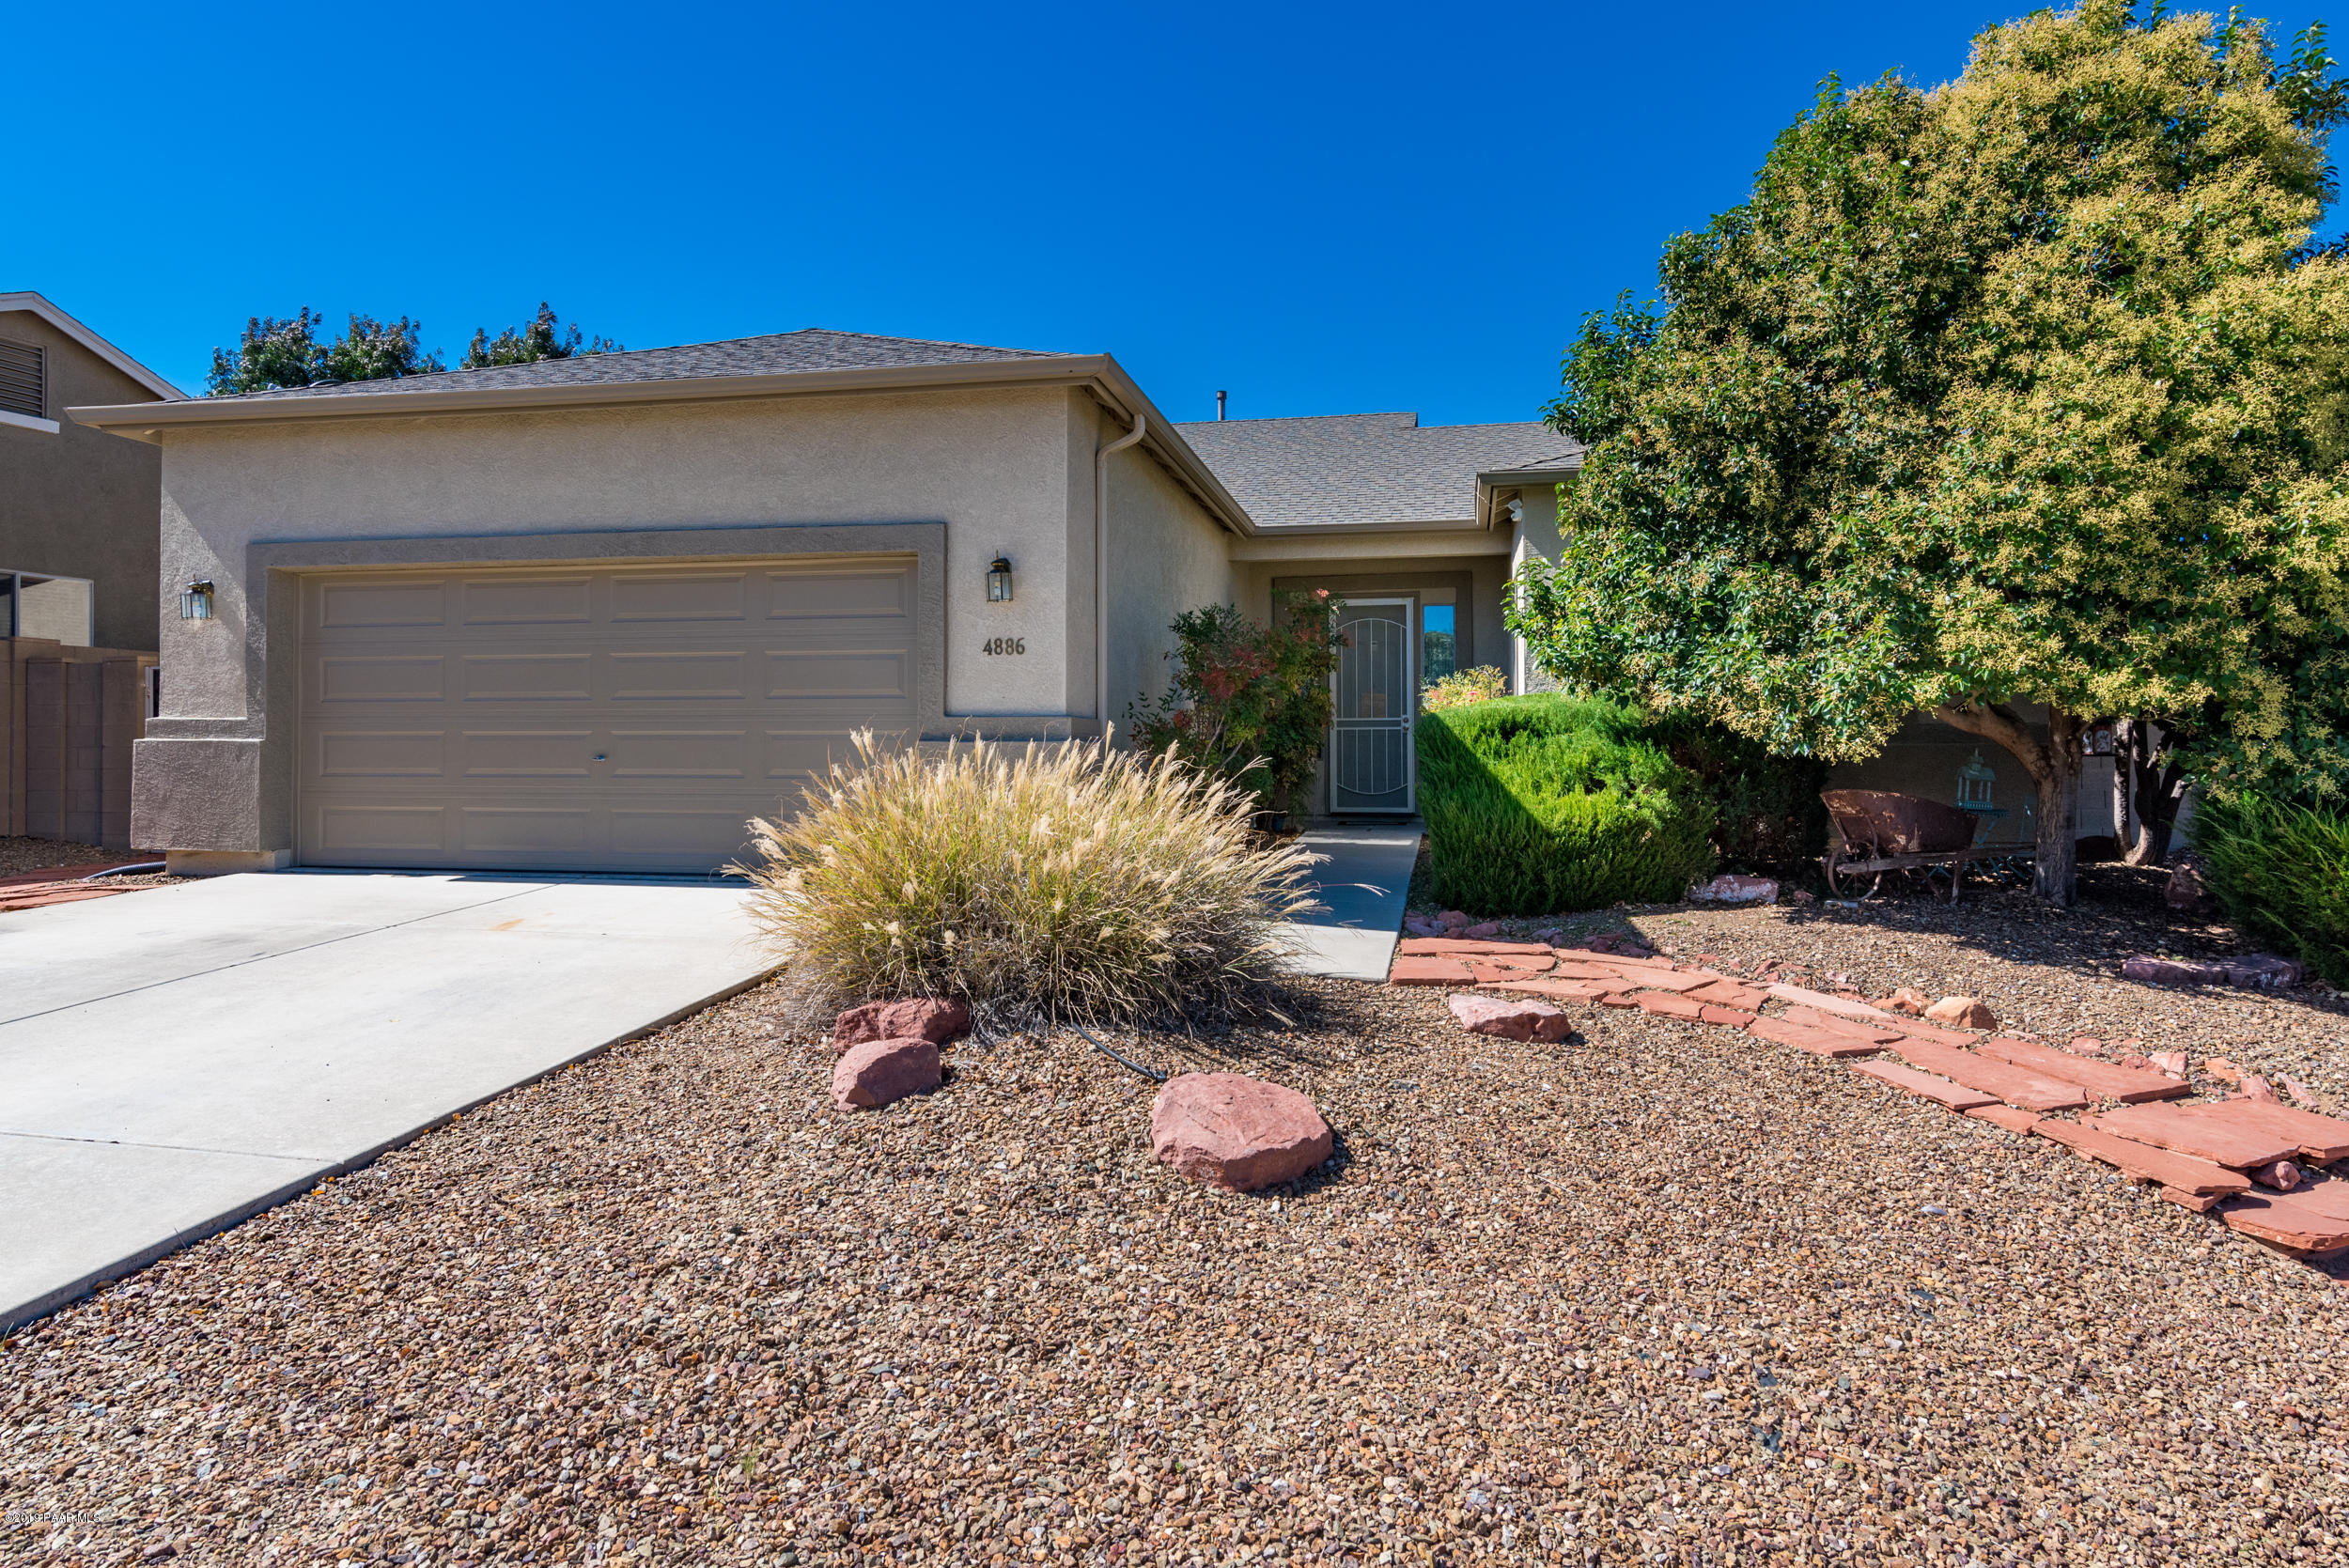 Photo of 4886 Wycliffe, Prescott Valley, AZ 86314